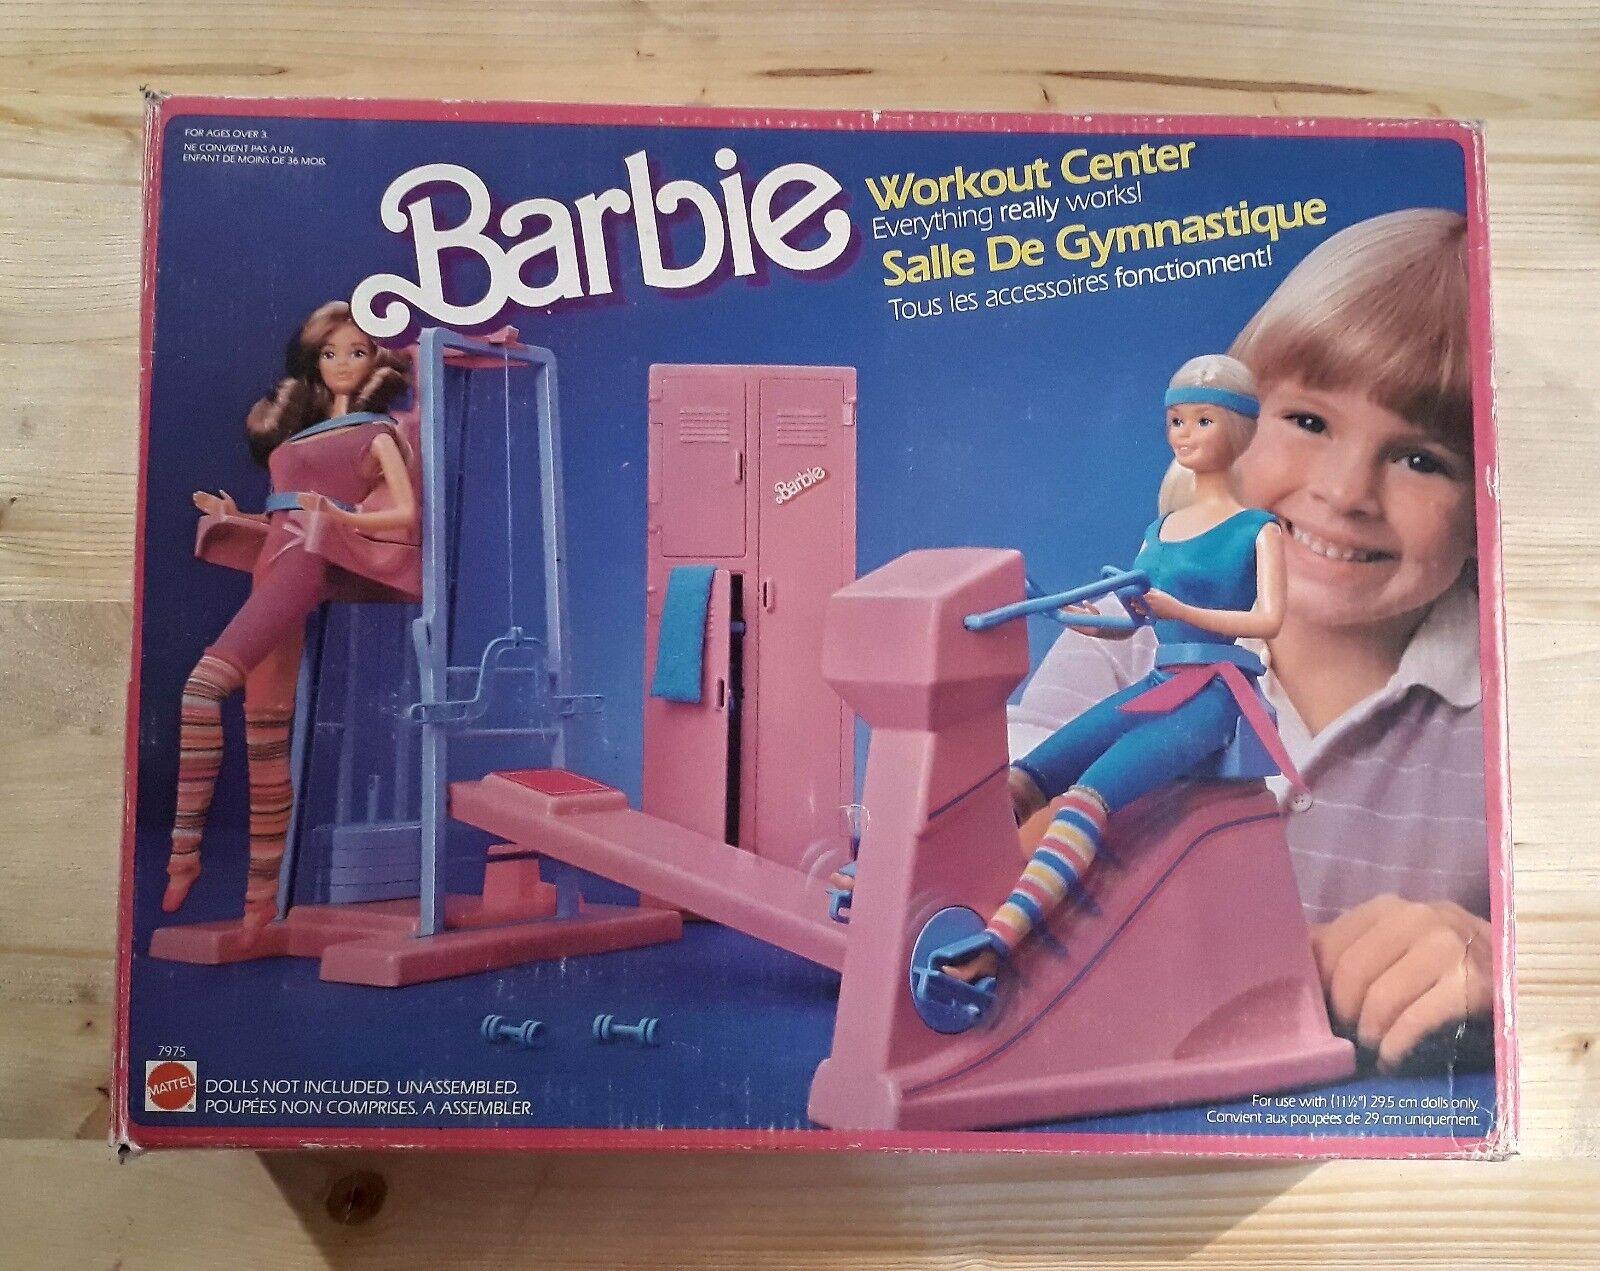 BARBIE Palestra - Workout Center (Mattel 1984, con scatola orginale)